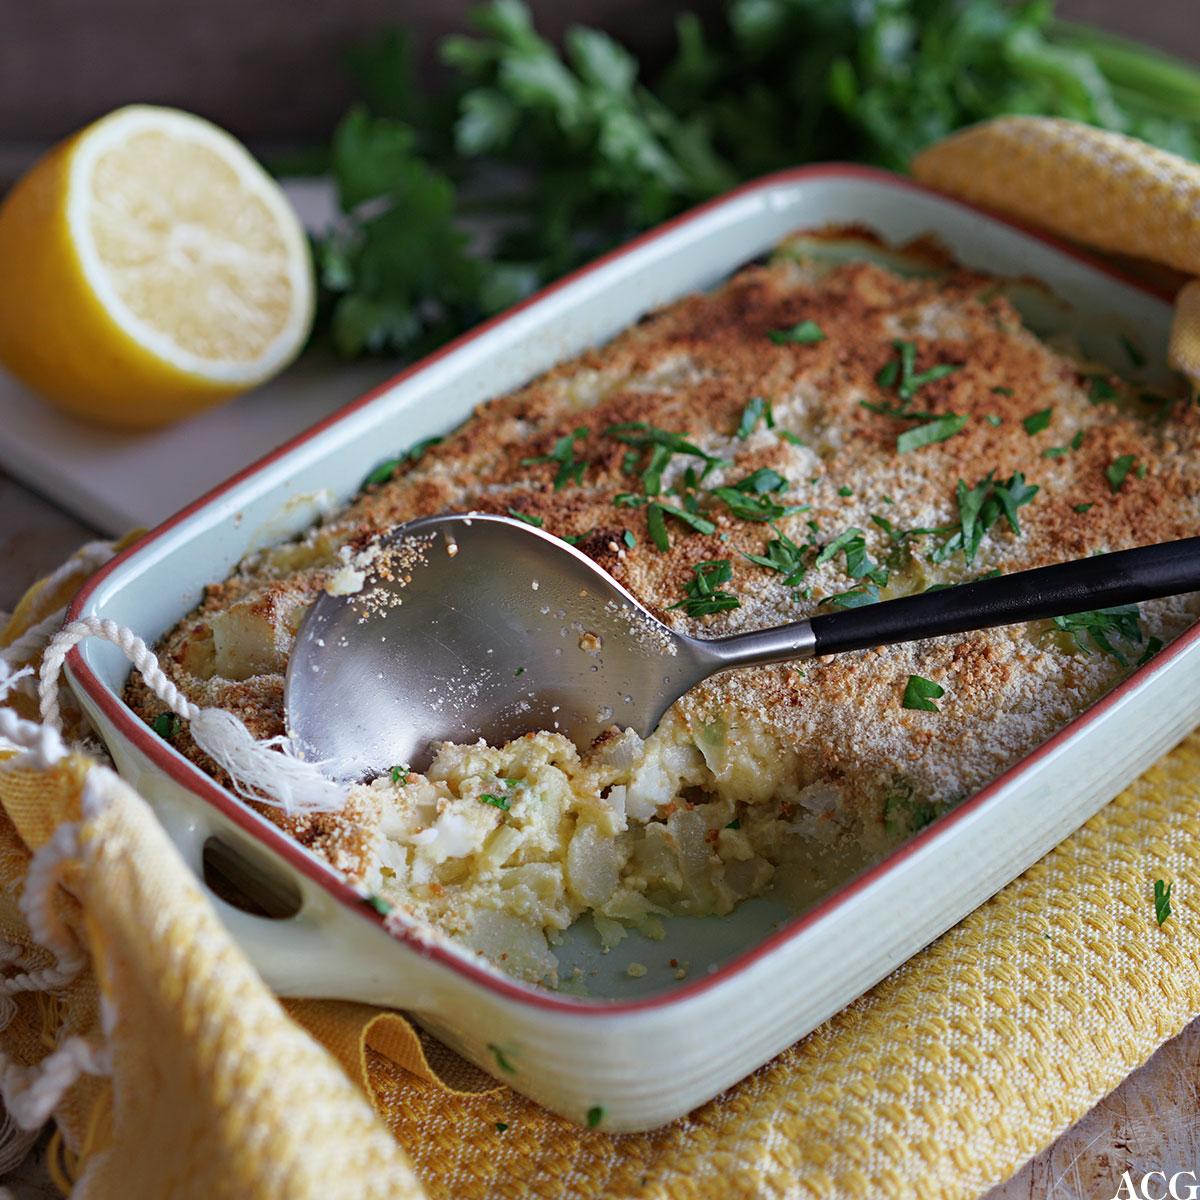 hjemmelaget fiskegrateng med poteter